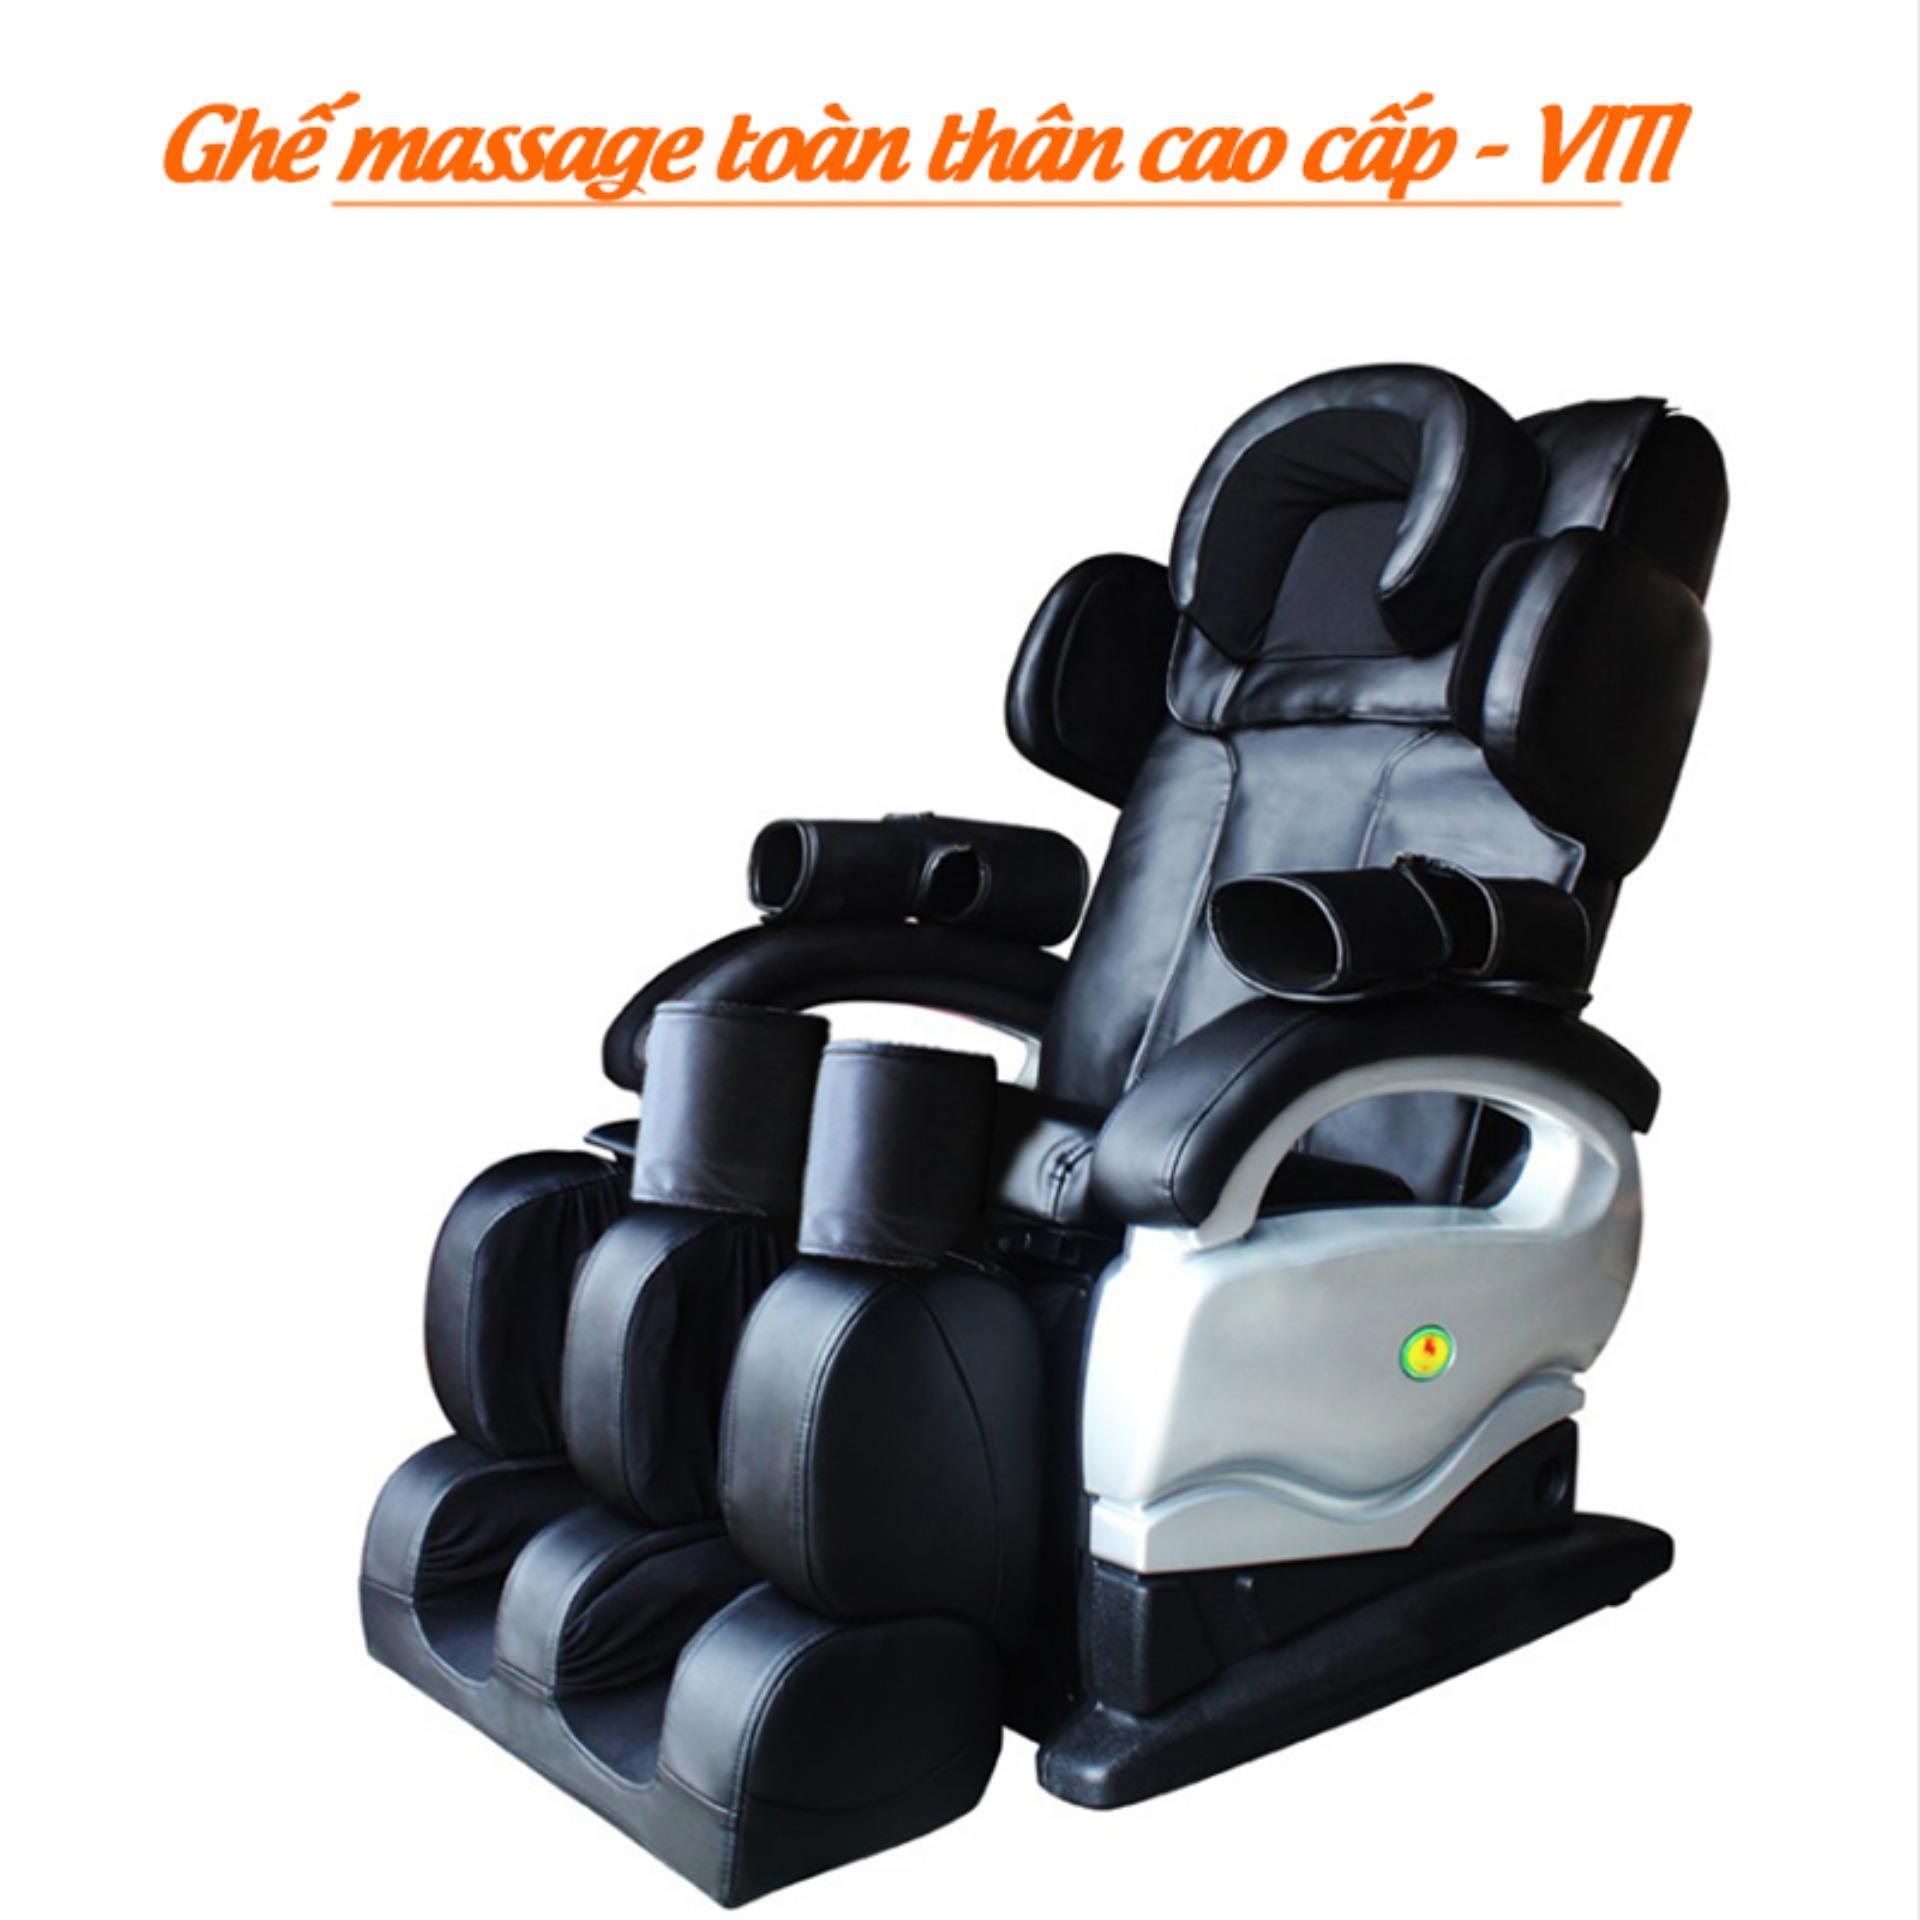 Ghế massage cao cấp VITI